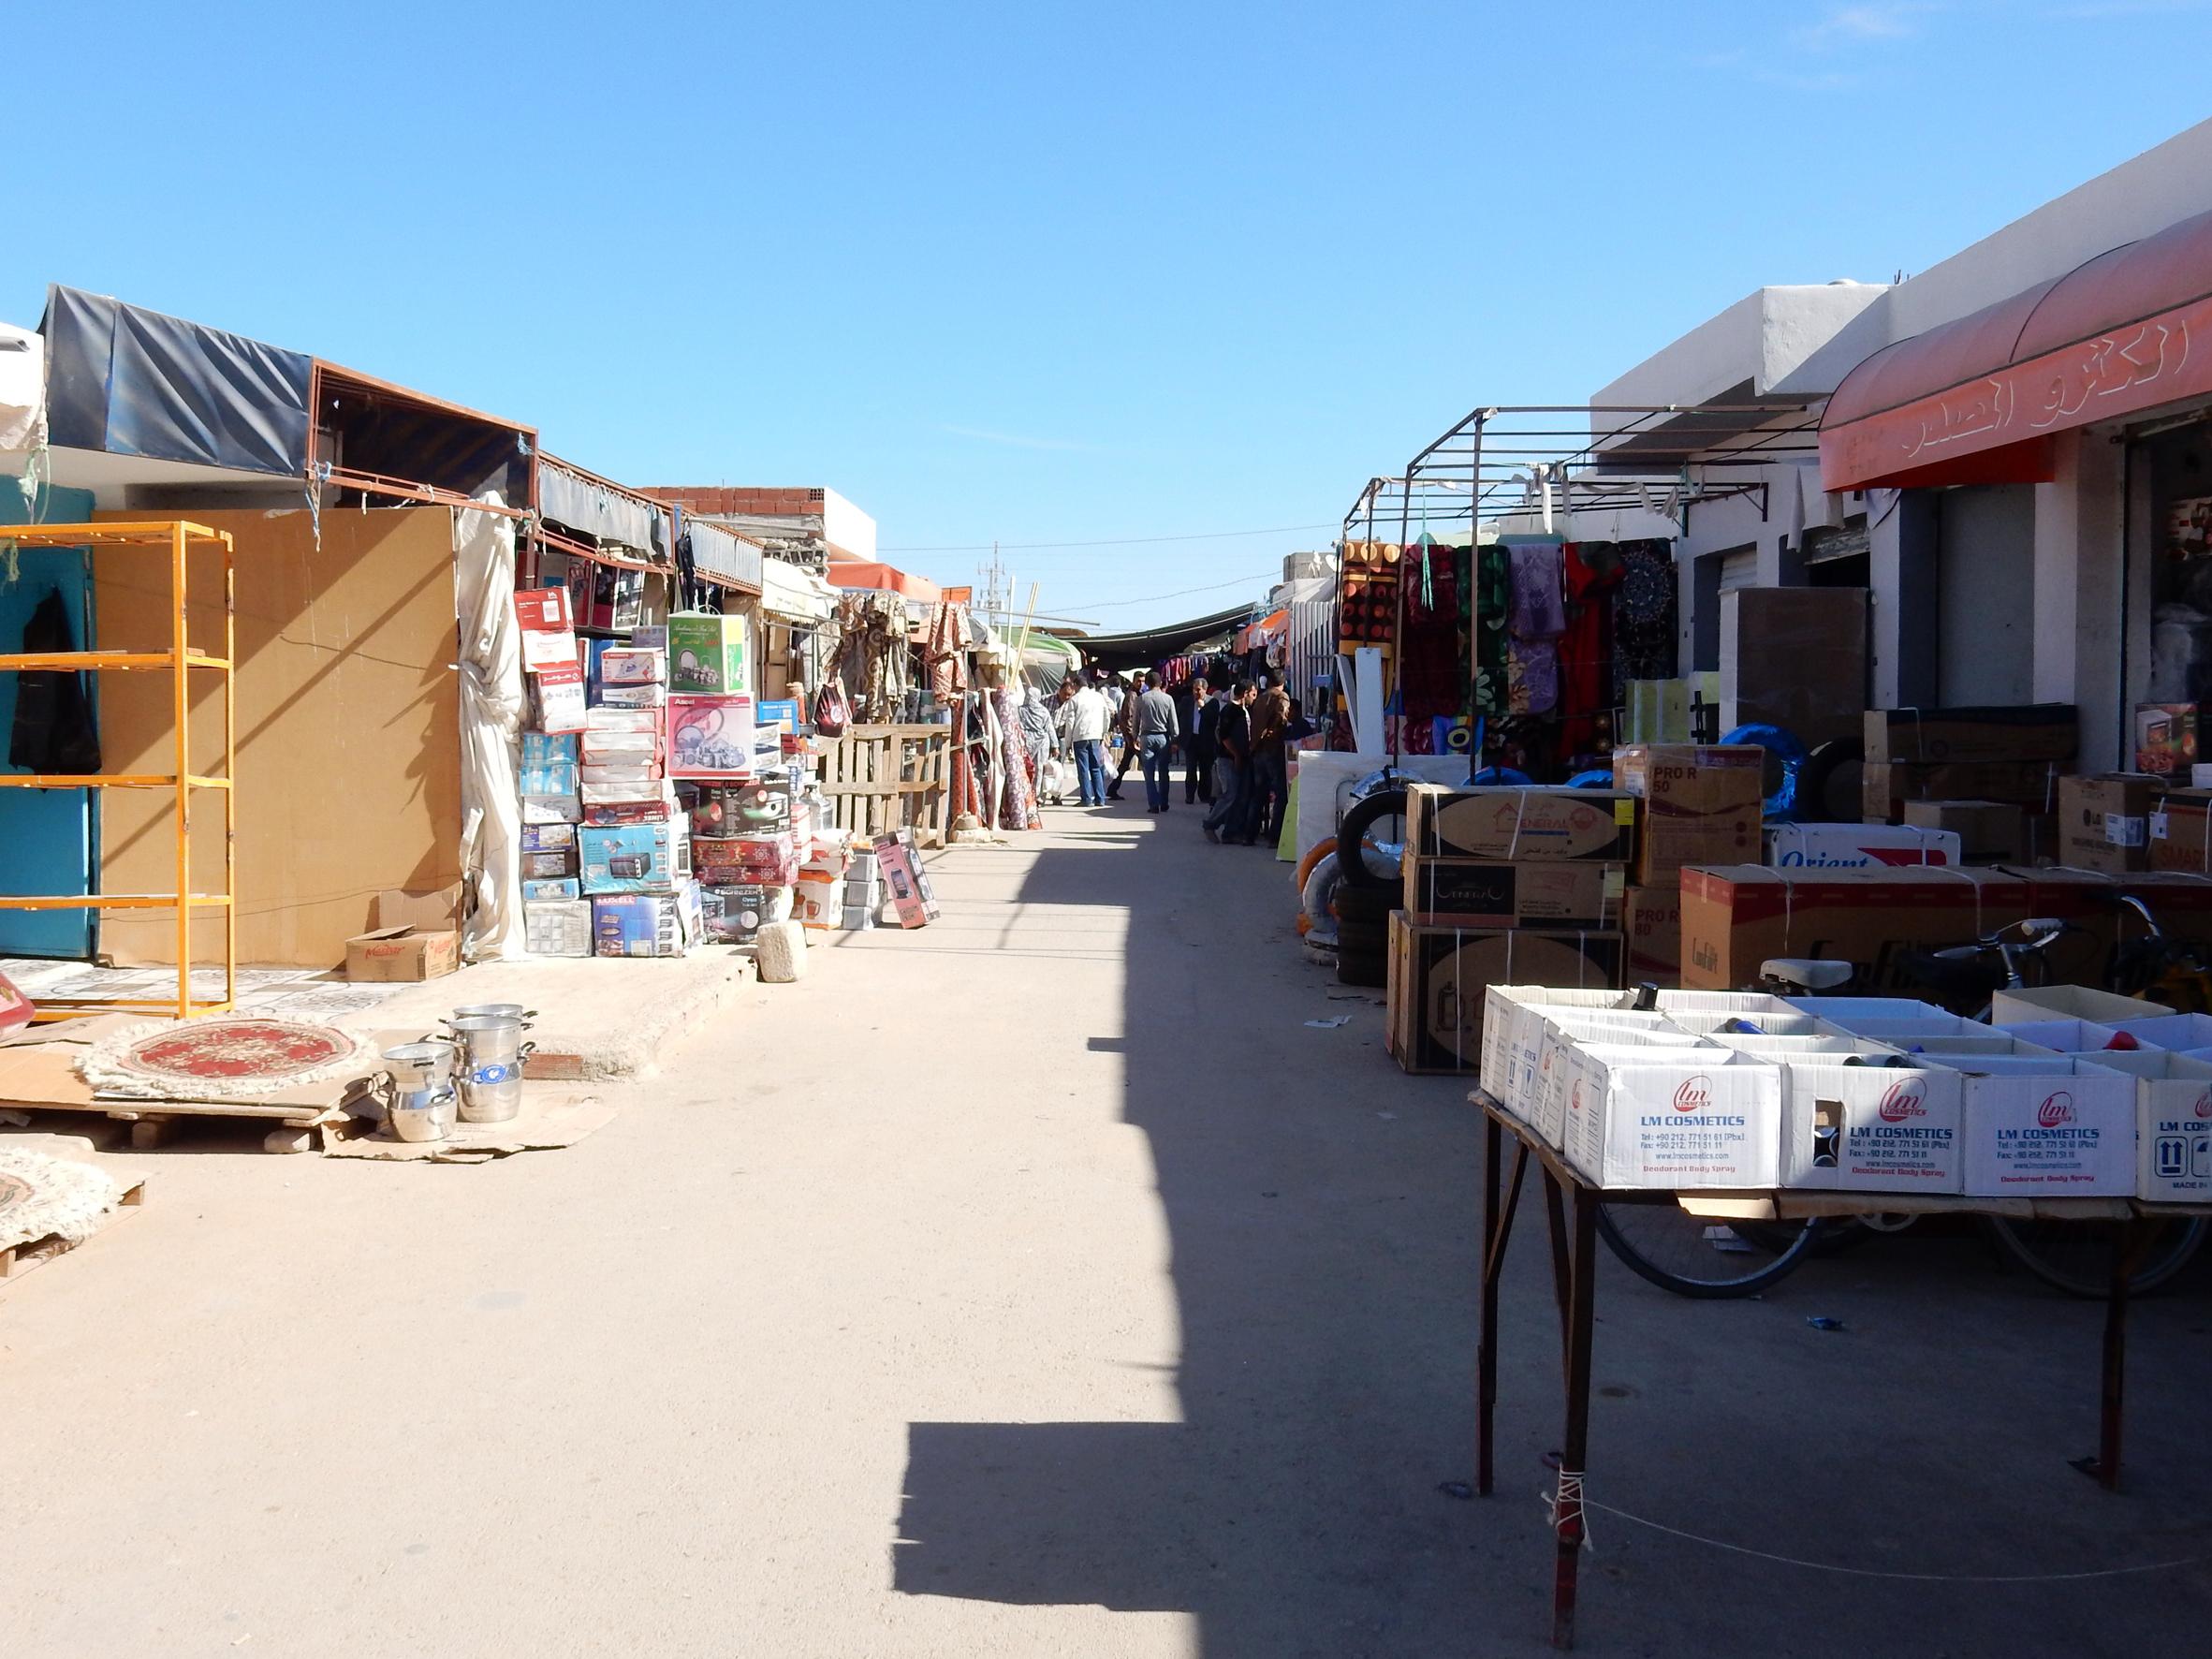 souk-Maghreb-adrien-doron-2014